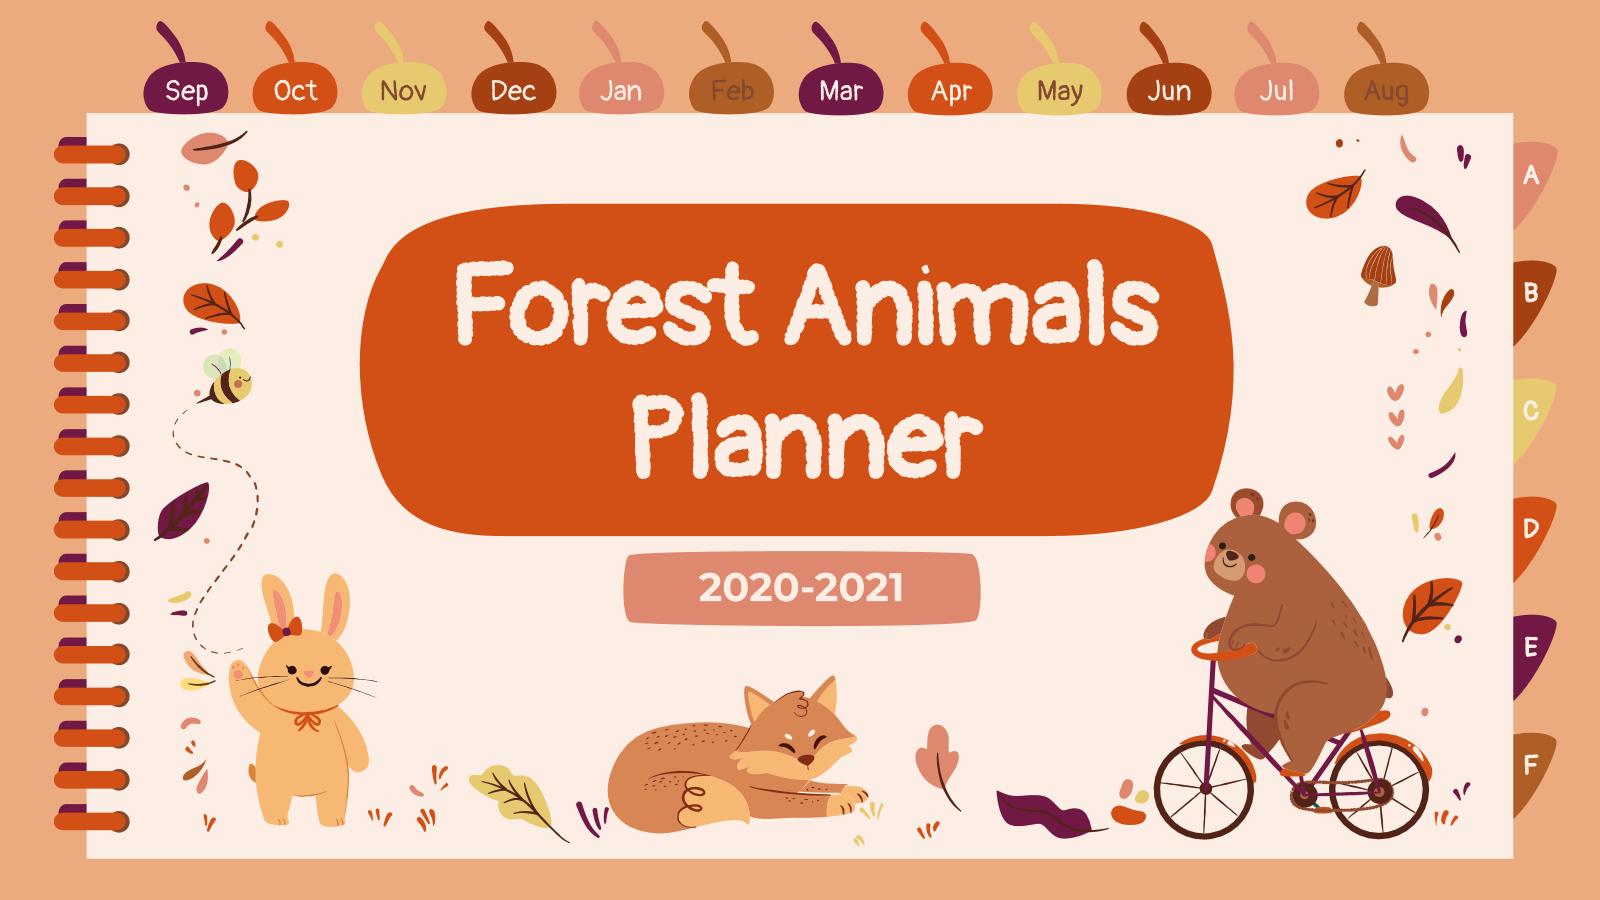 Forest Animals Planner presentation template